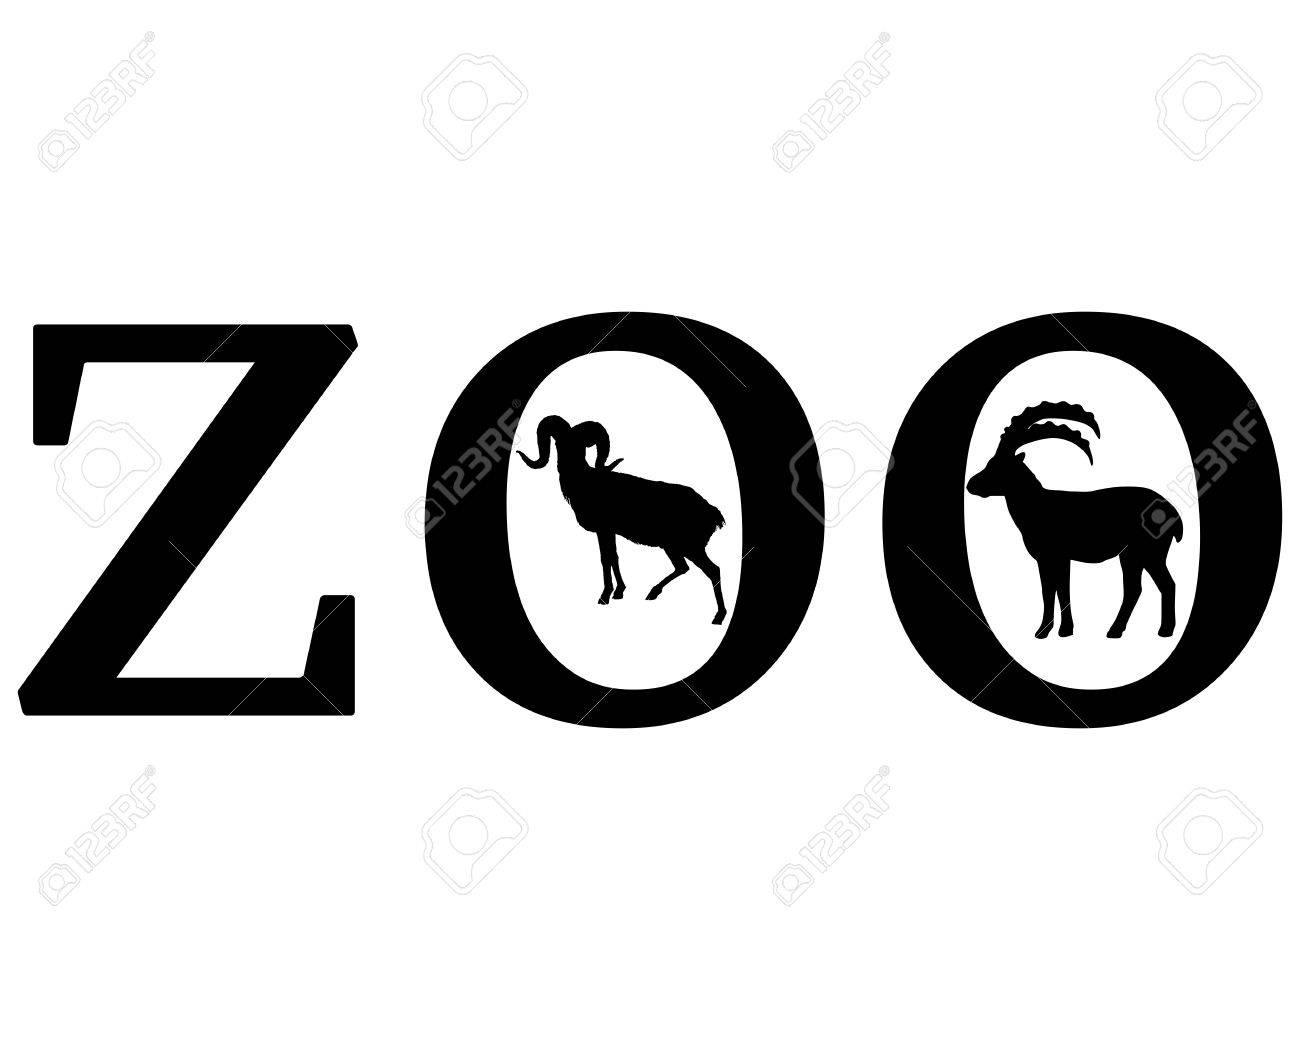 Zoo animals Stock Vector - 9348633